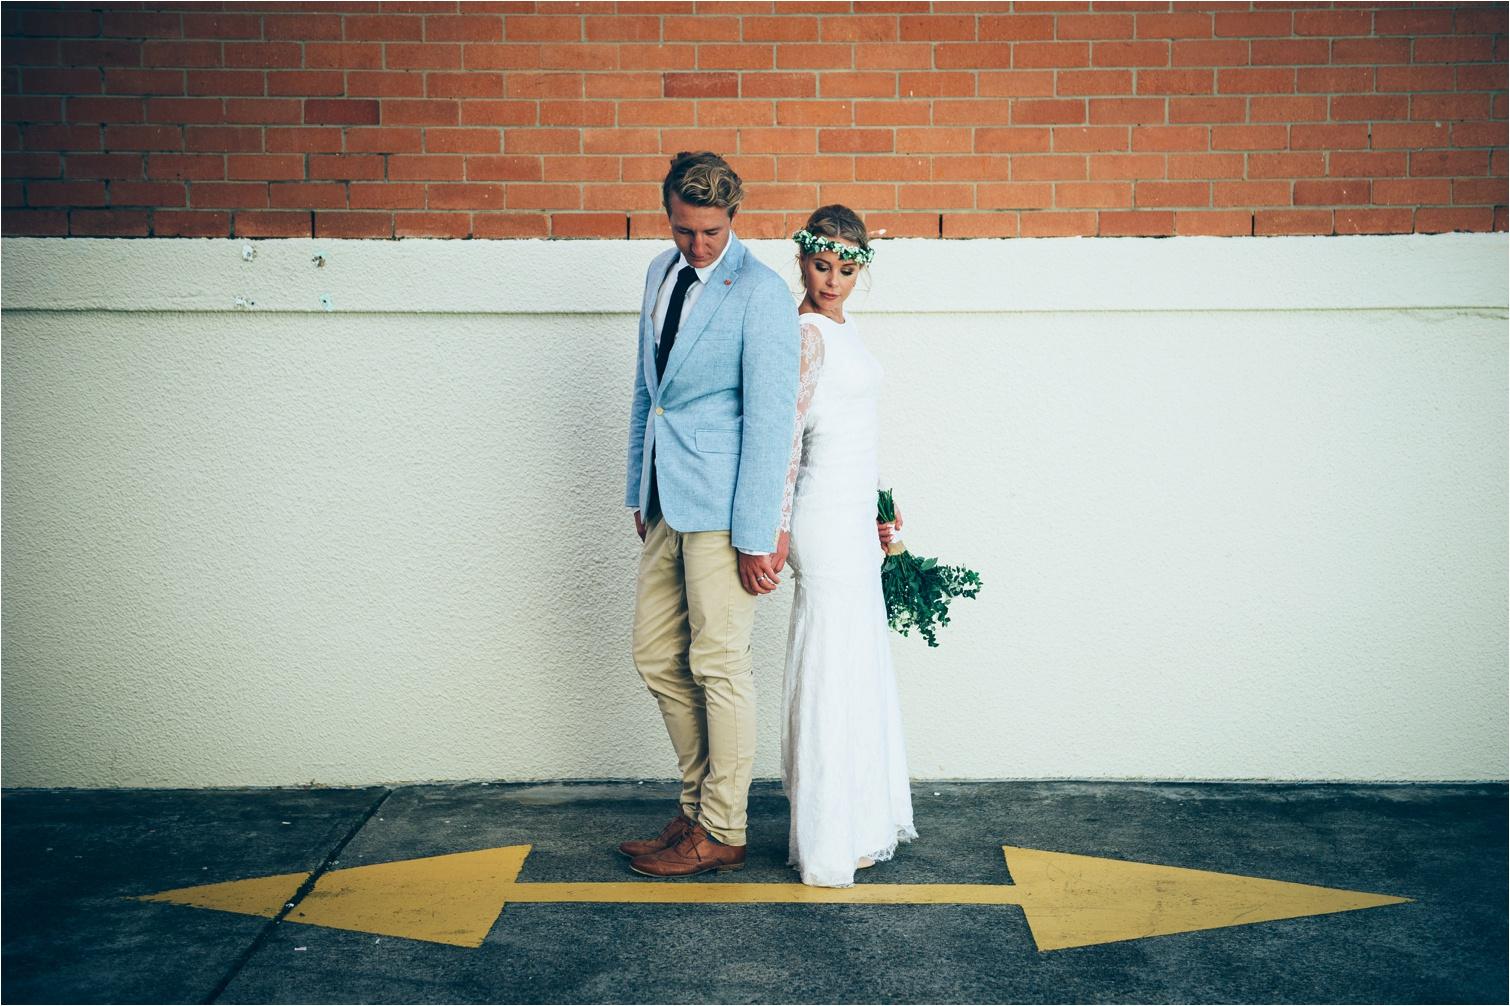 Gold_Coast_Kirra_Hill_Community_Centre_Wedding-by_The_Follans_0051.jpg